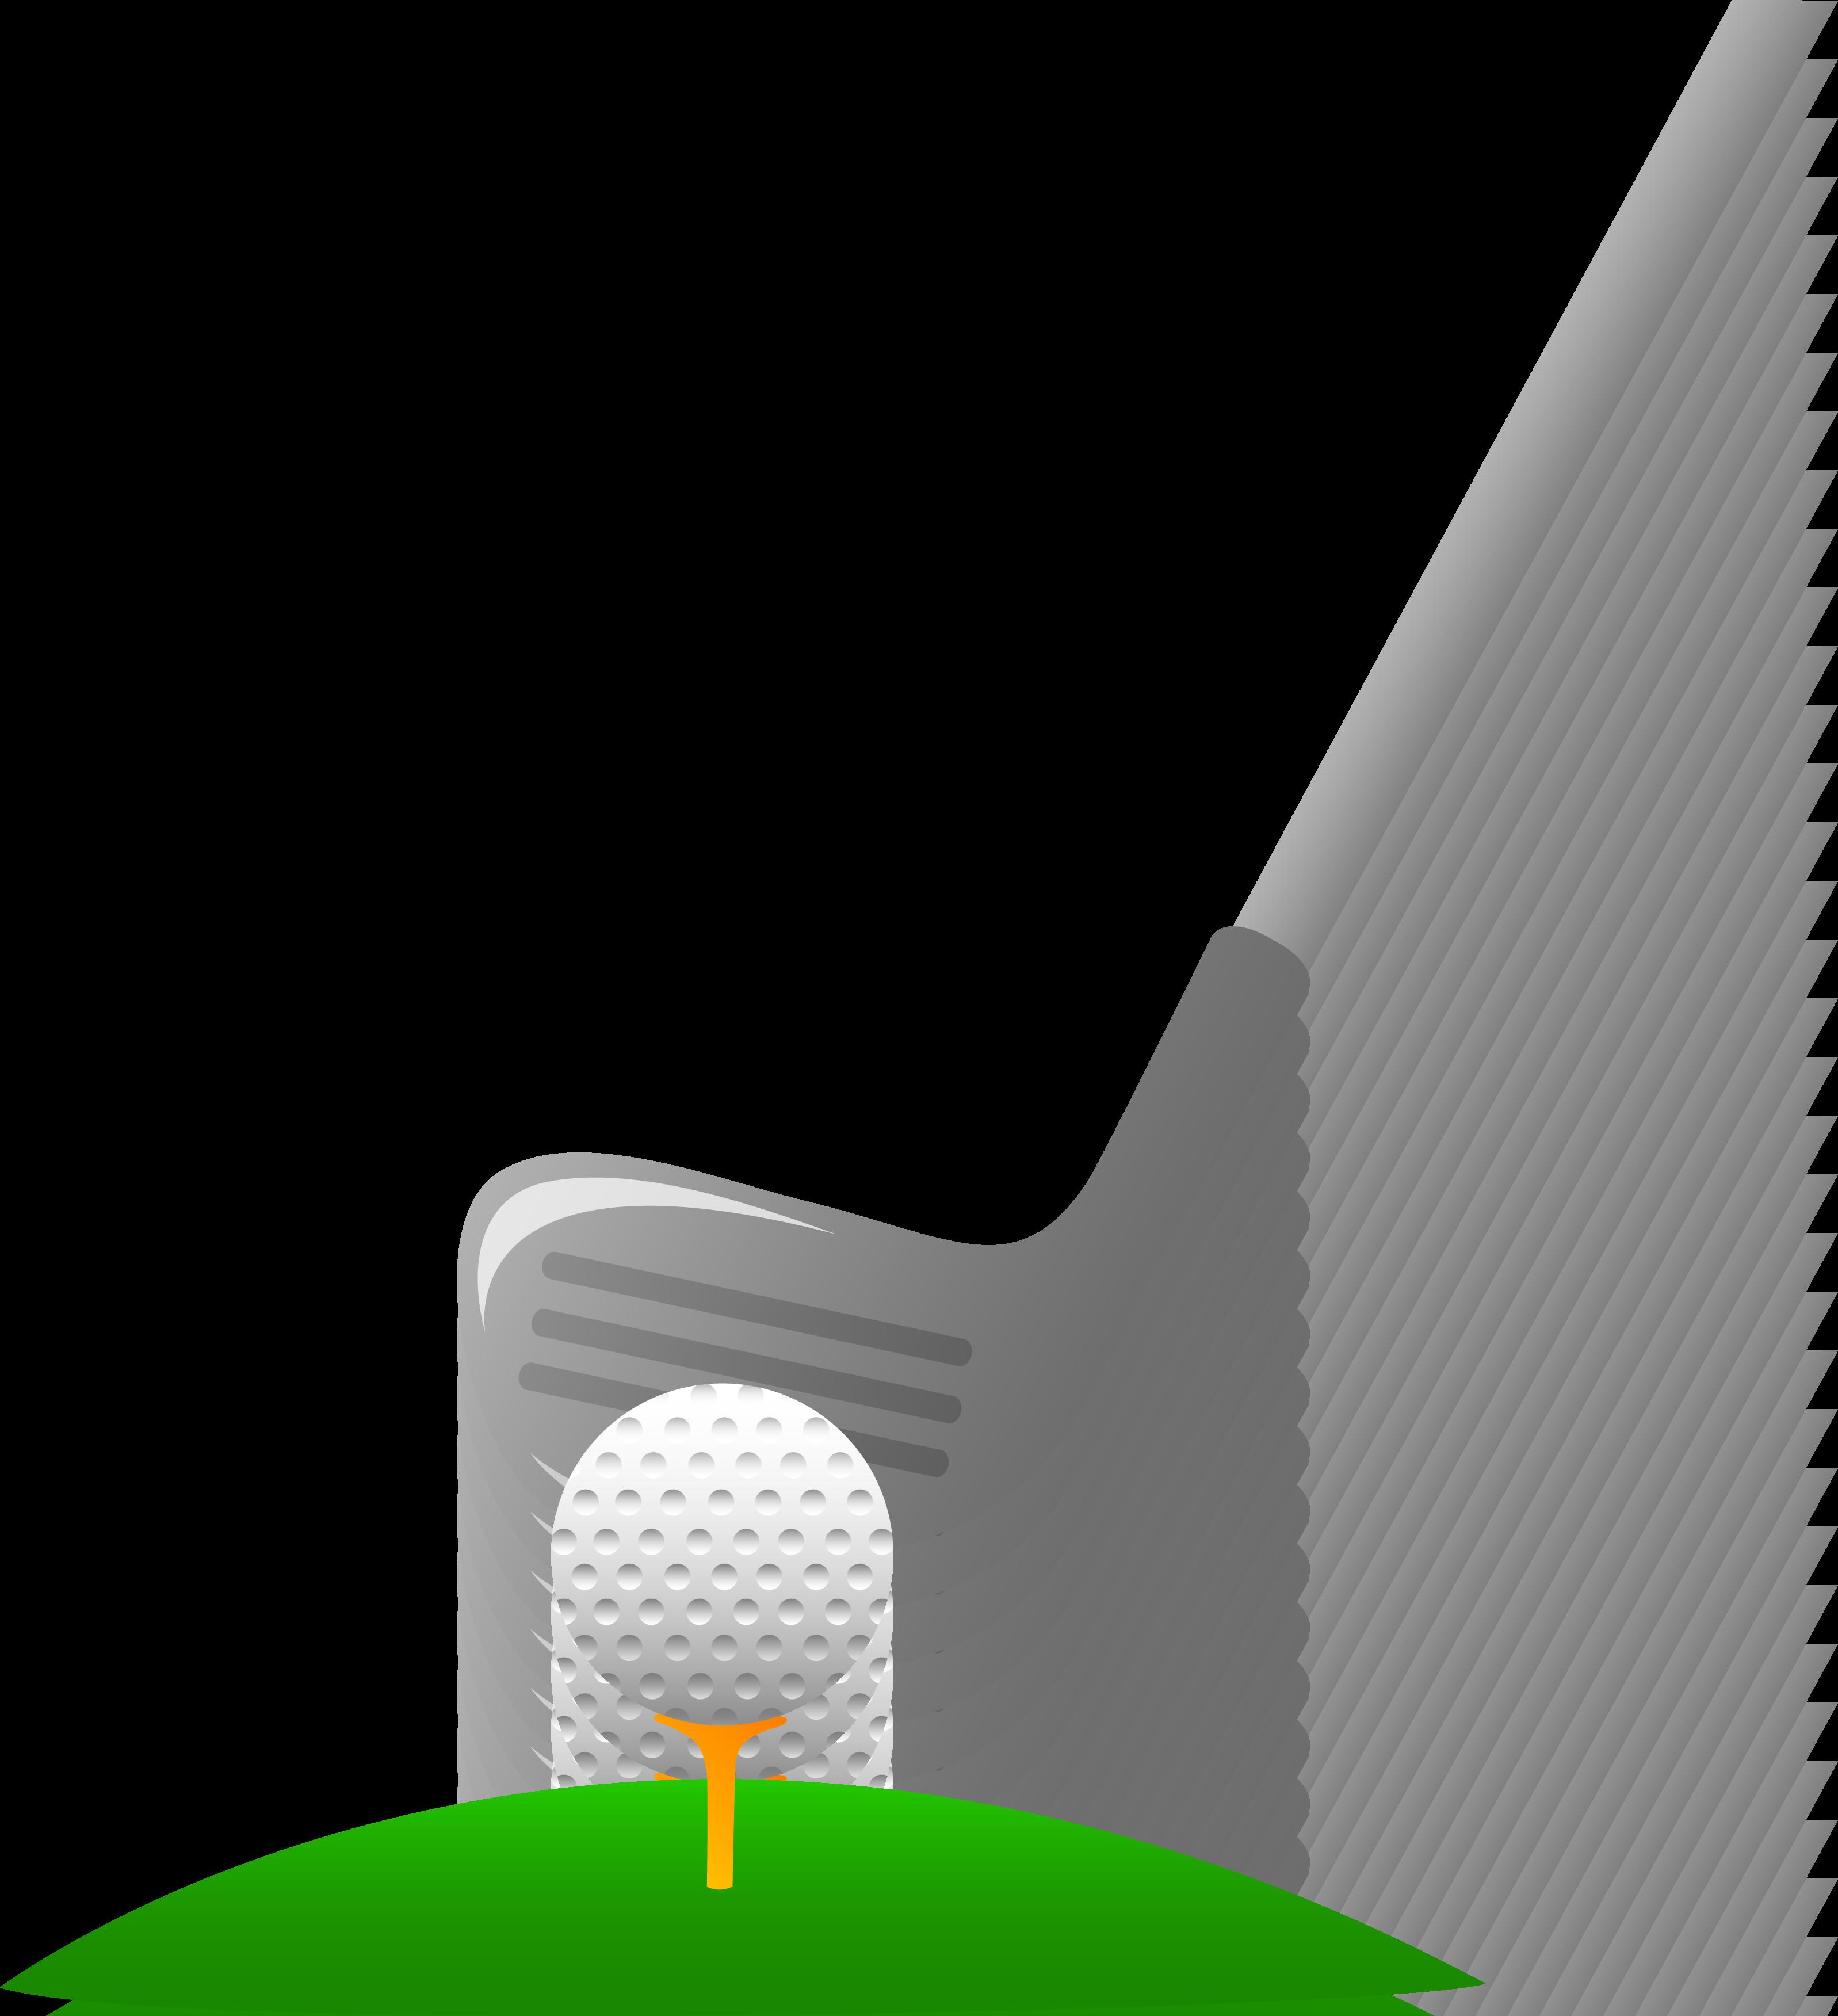 Golf Club And Ball Clipart #1-Golf Club And Ball Clipart #1-8